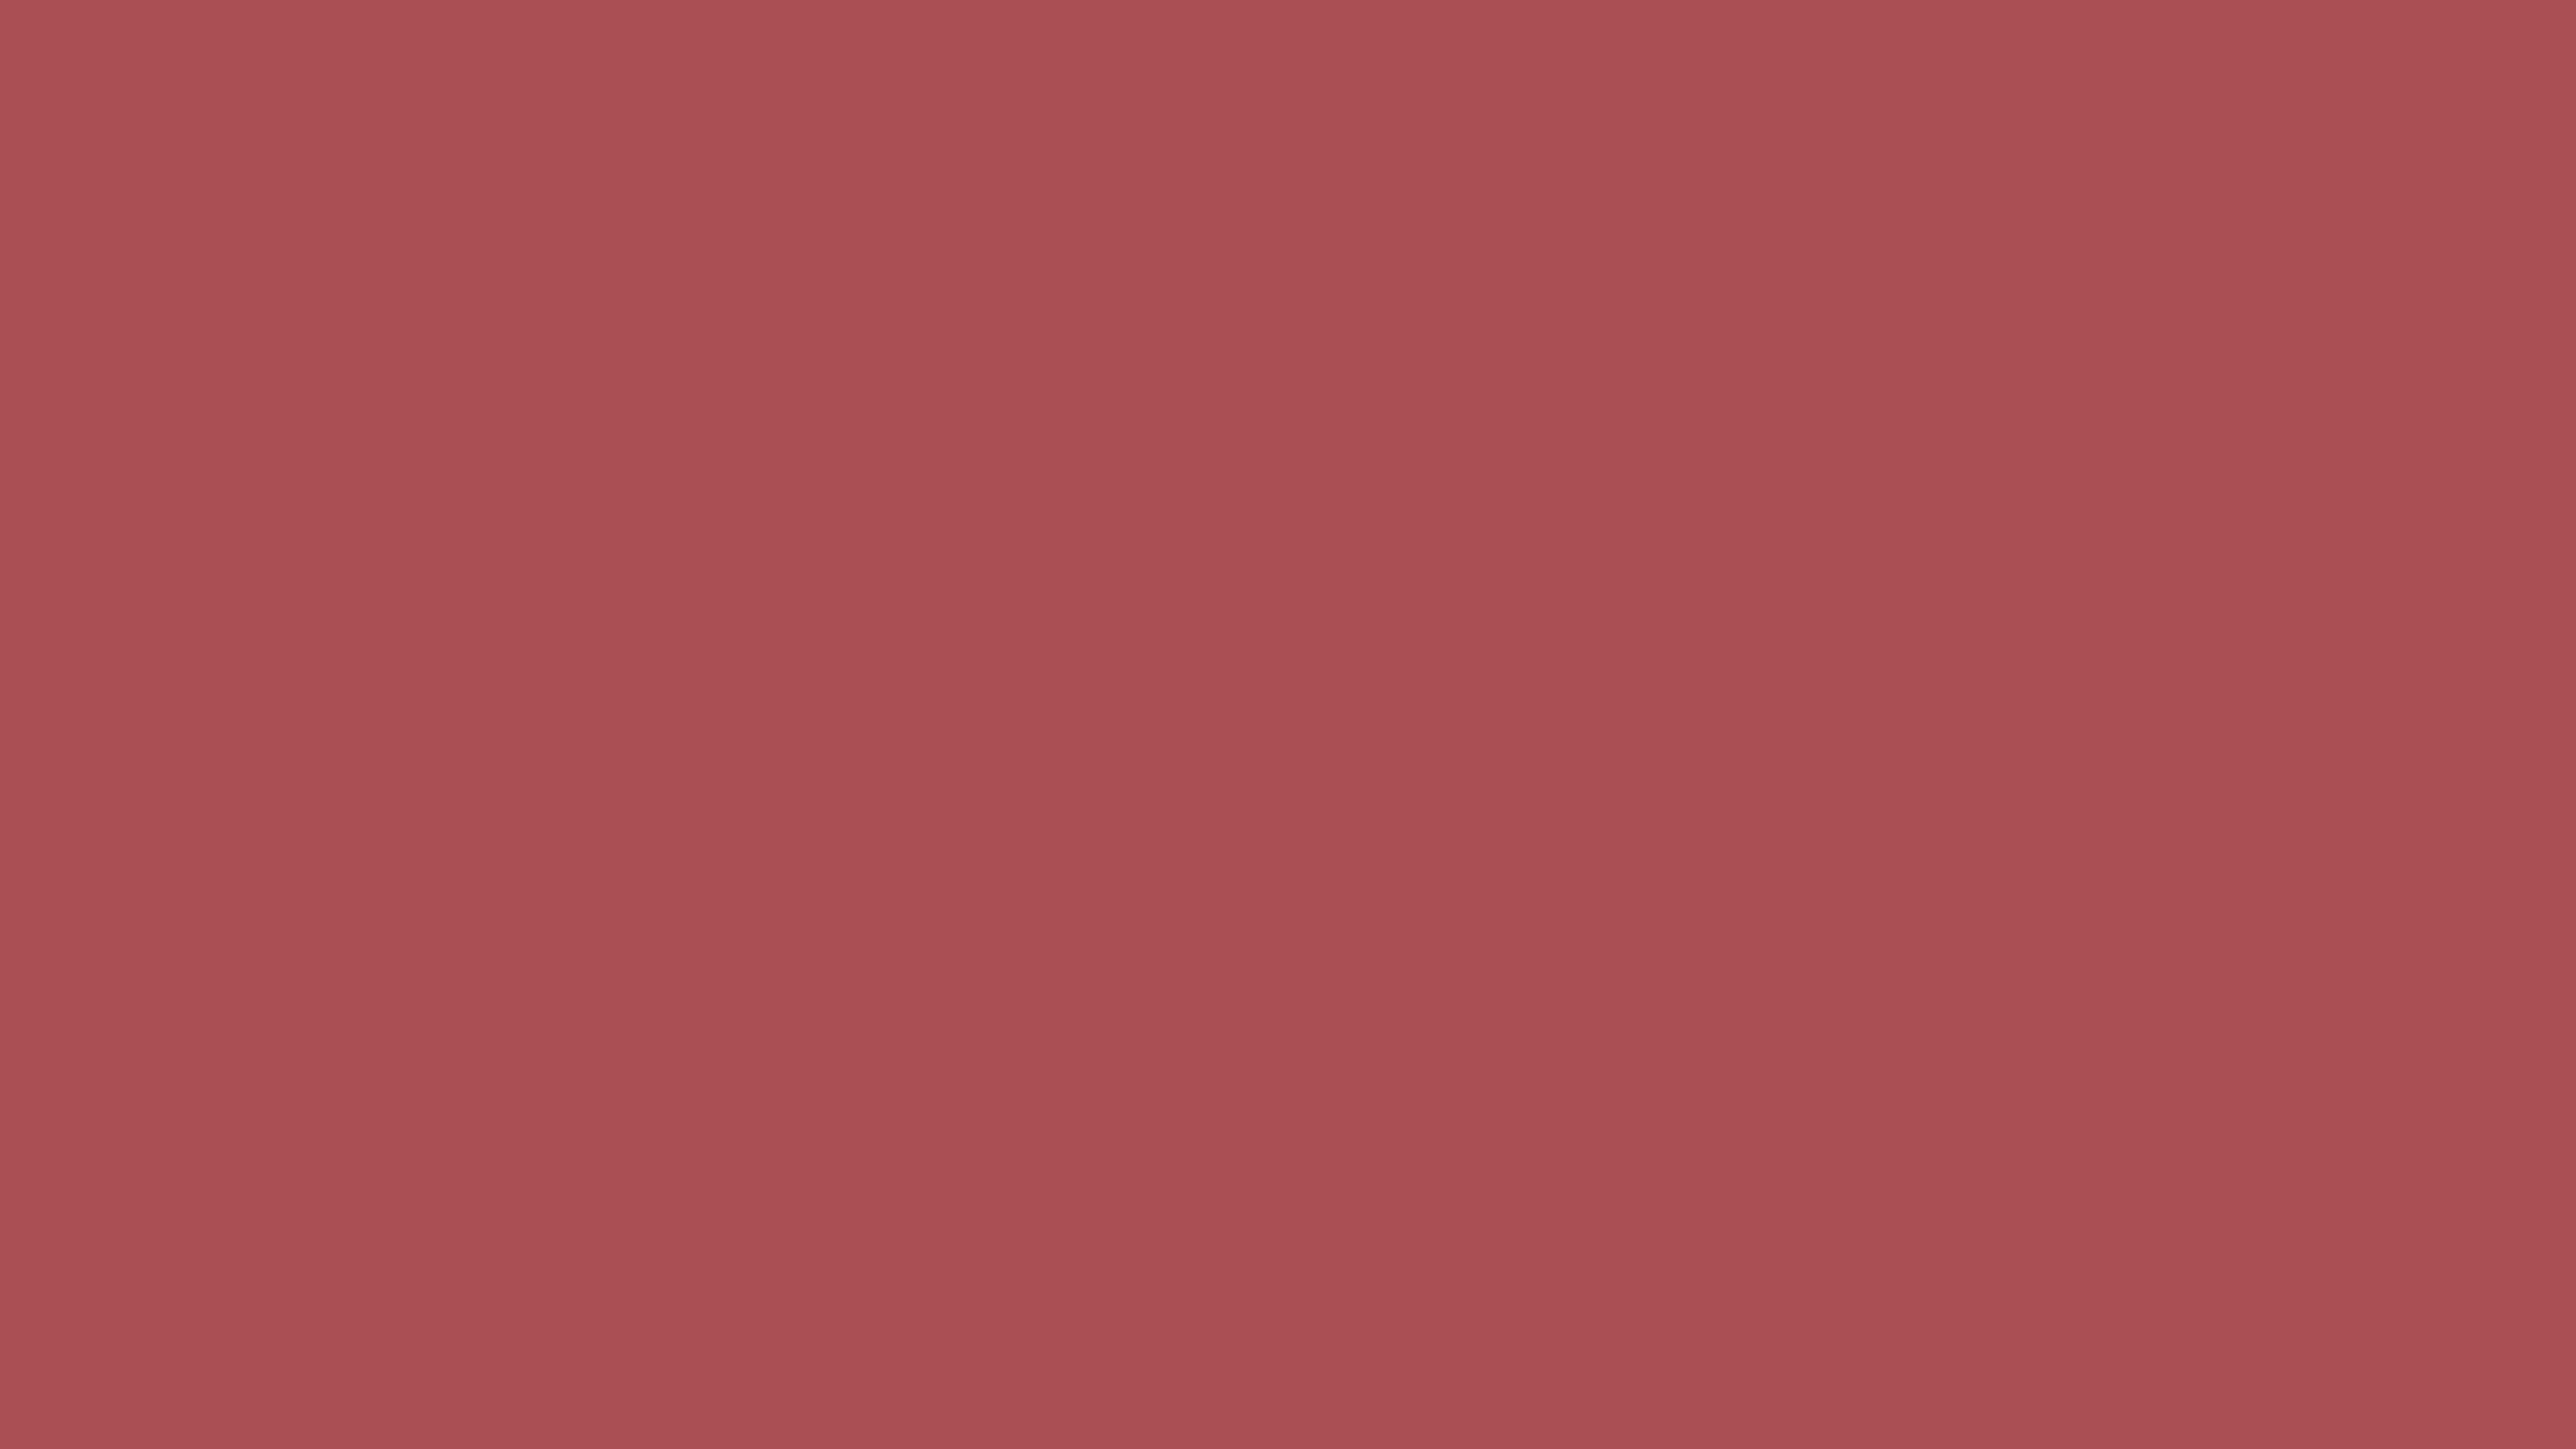 3840x2160 Rose Vale Solid Color Background